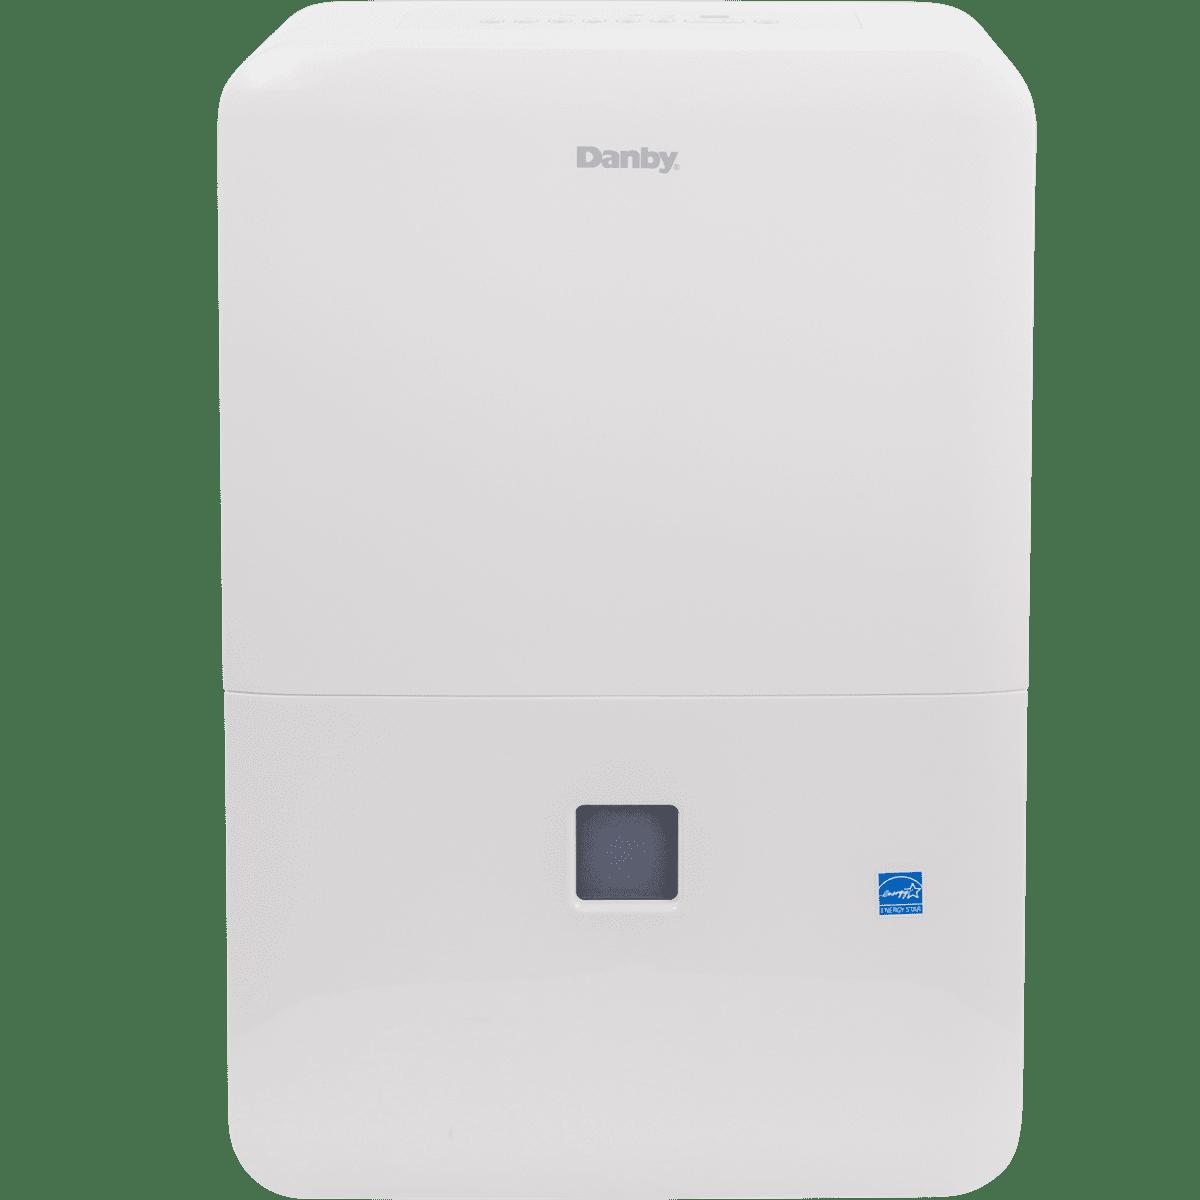 danby premiere 70 pint dehumidifier free shipping sylvane rh sylvane com